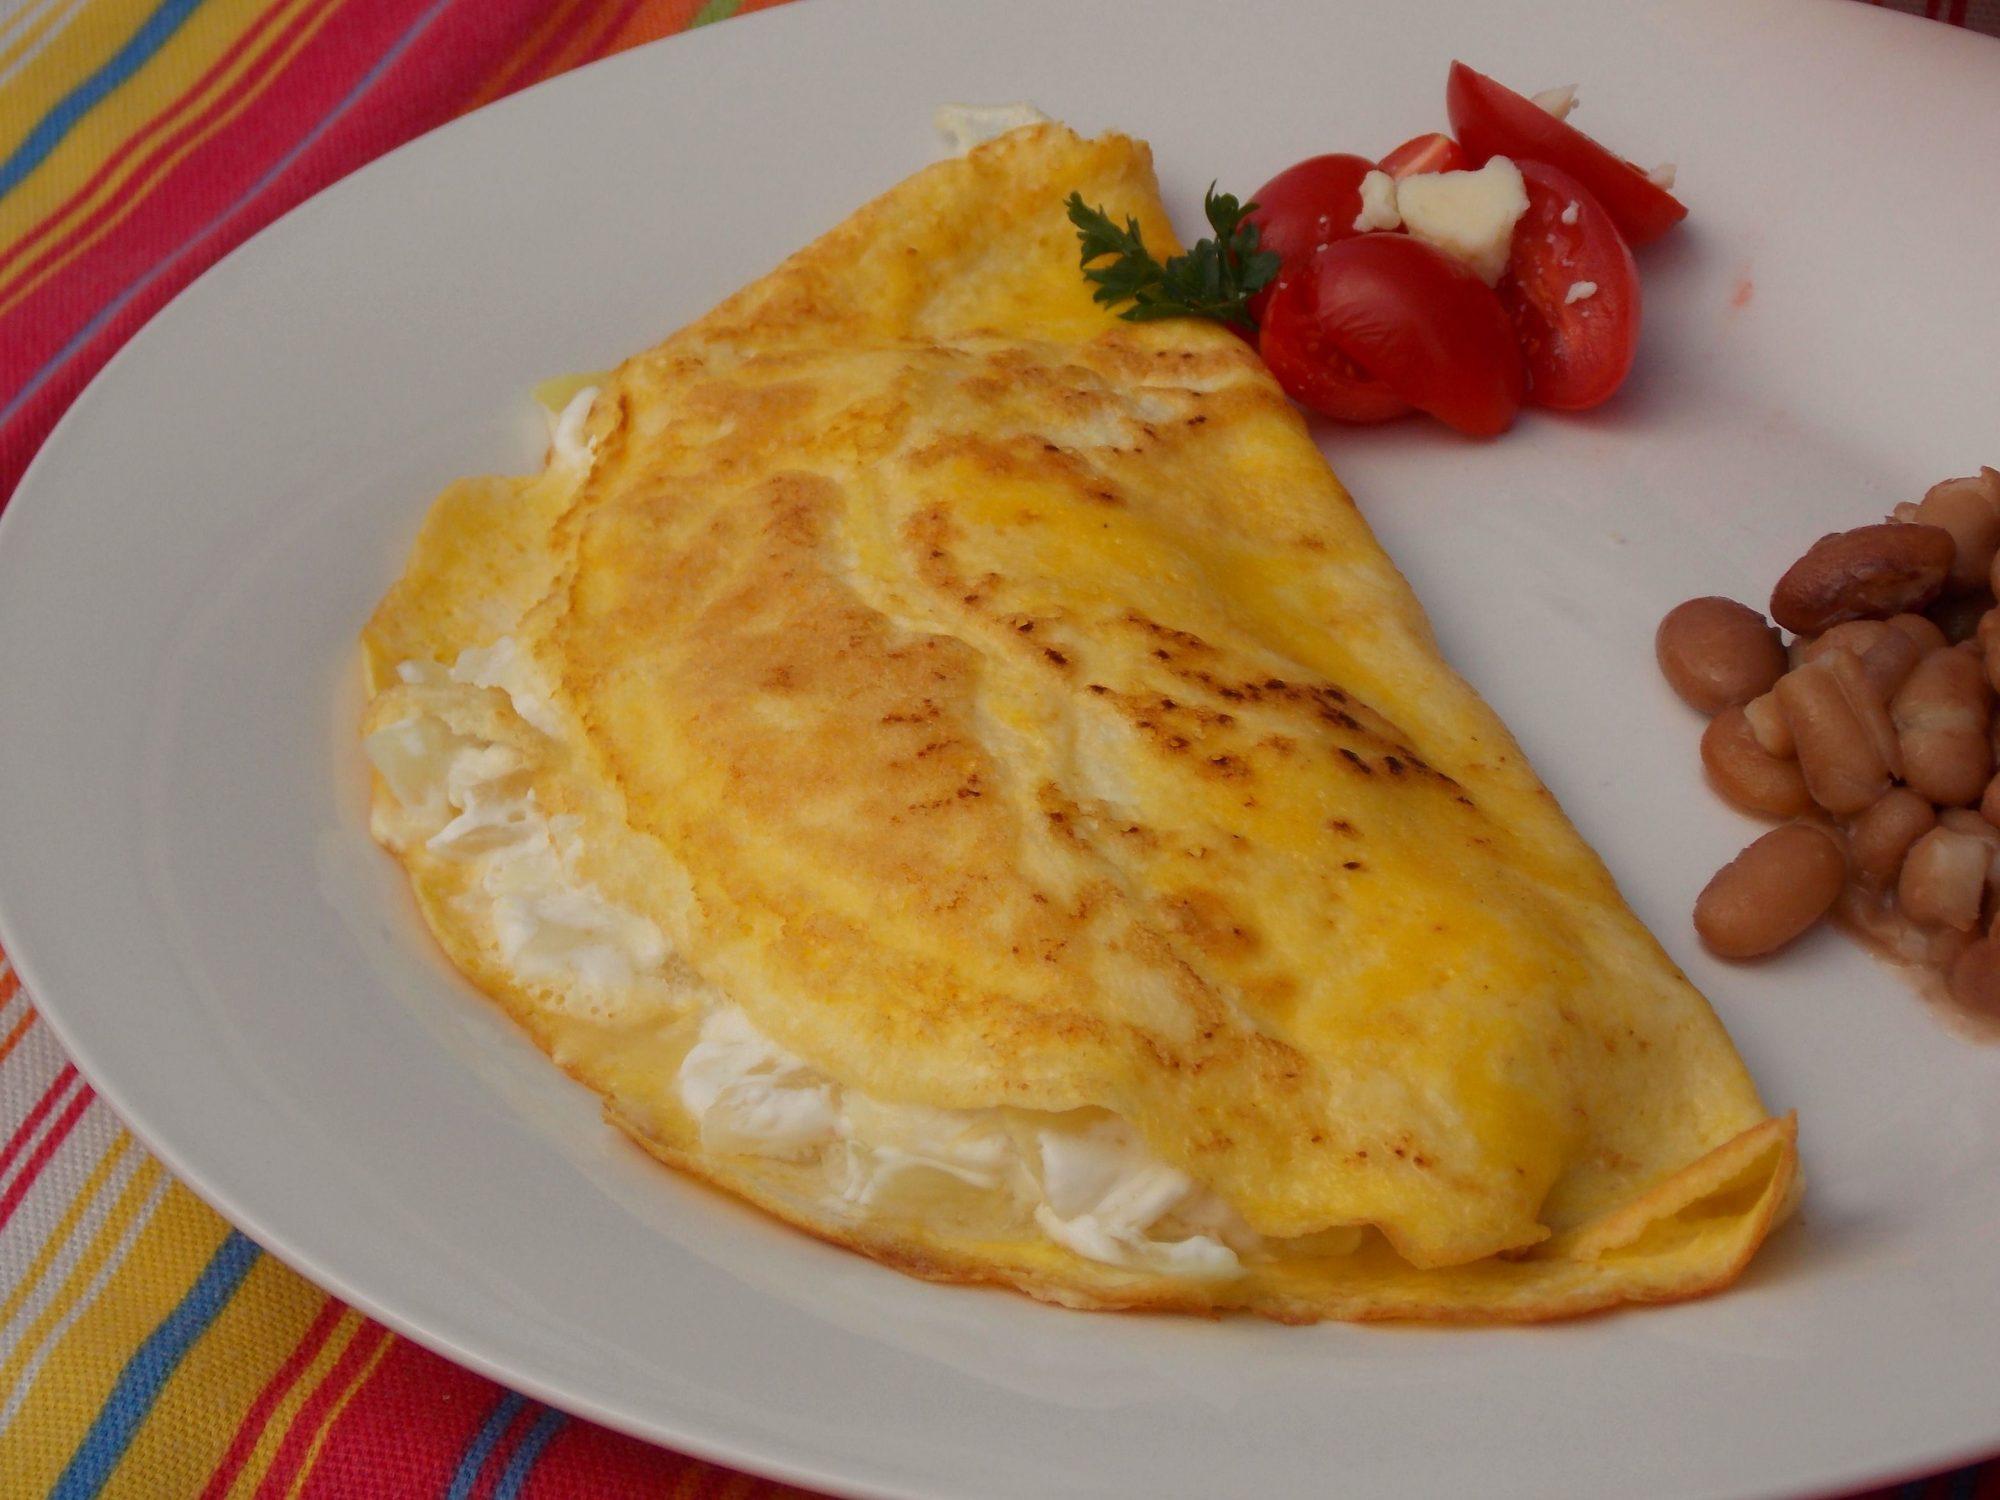 Omelette con cebolla y queso